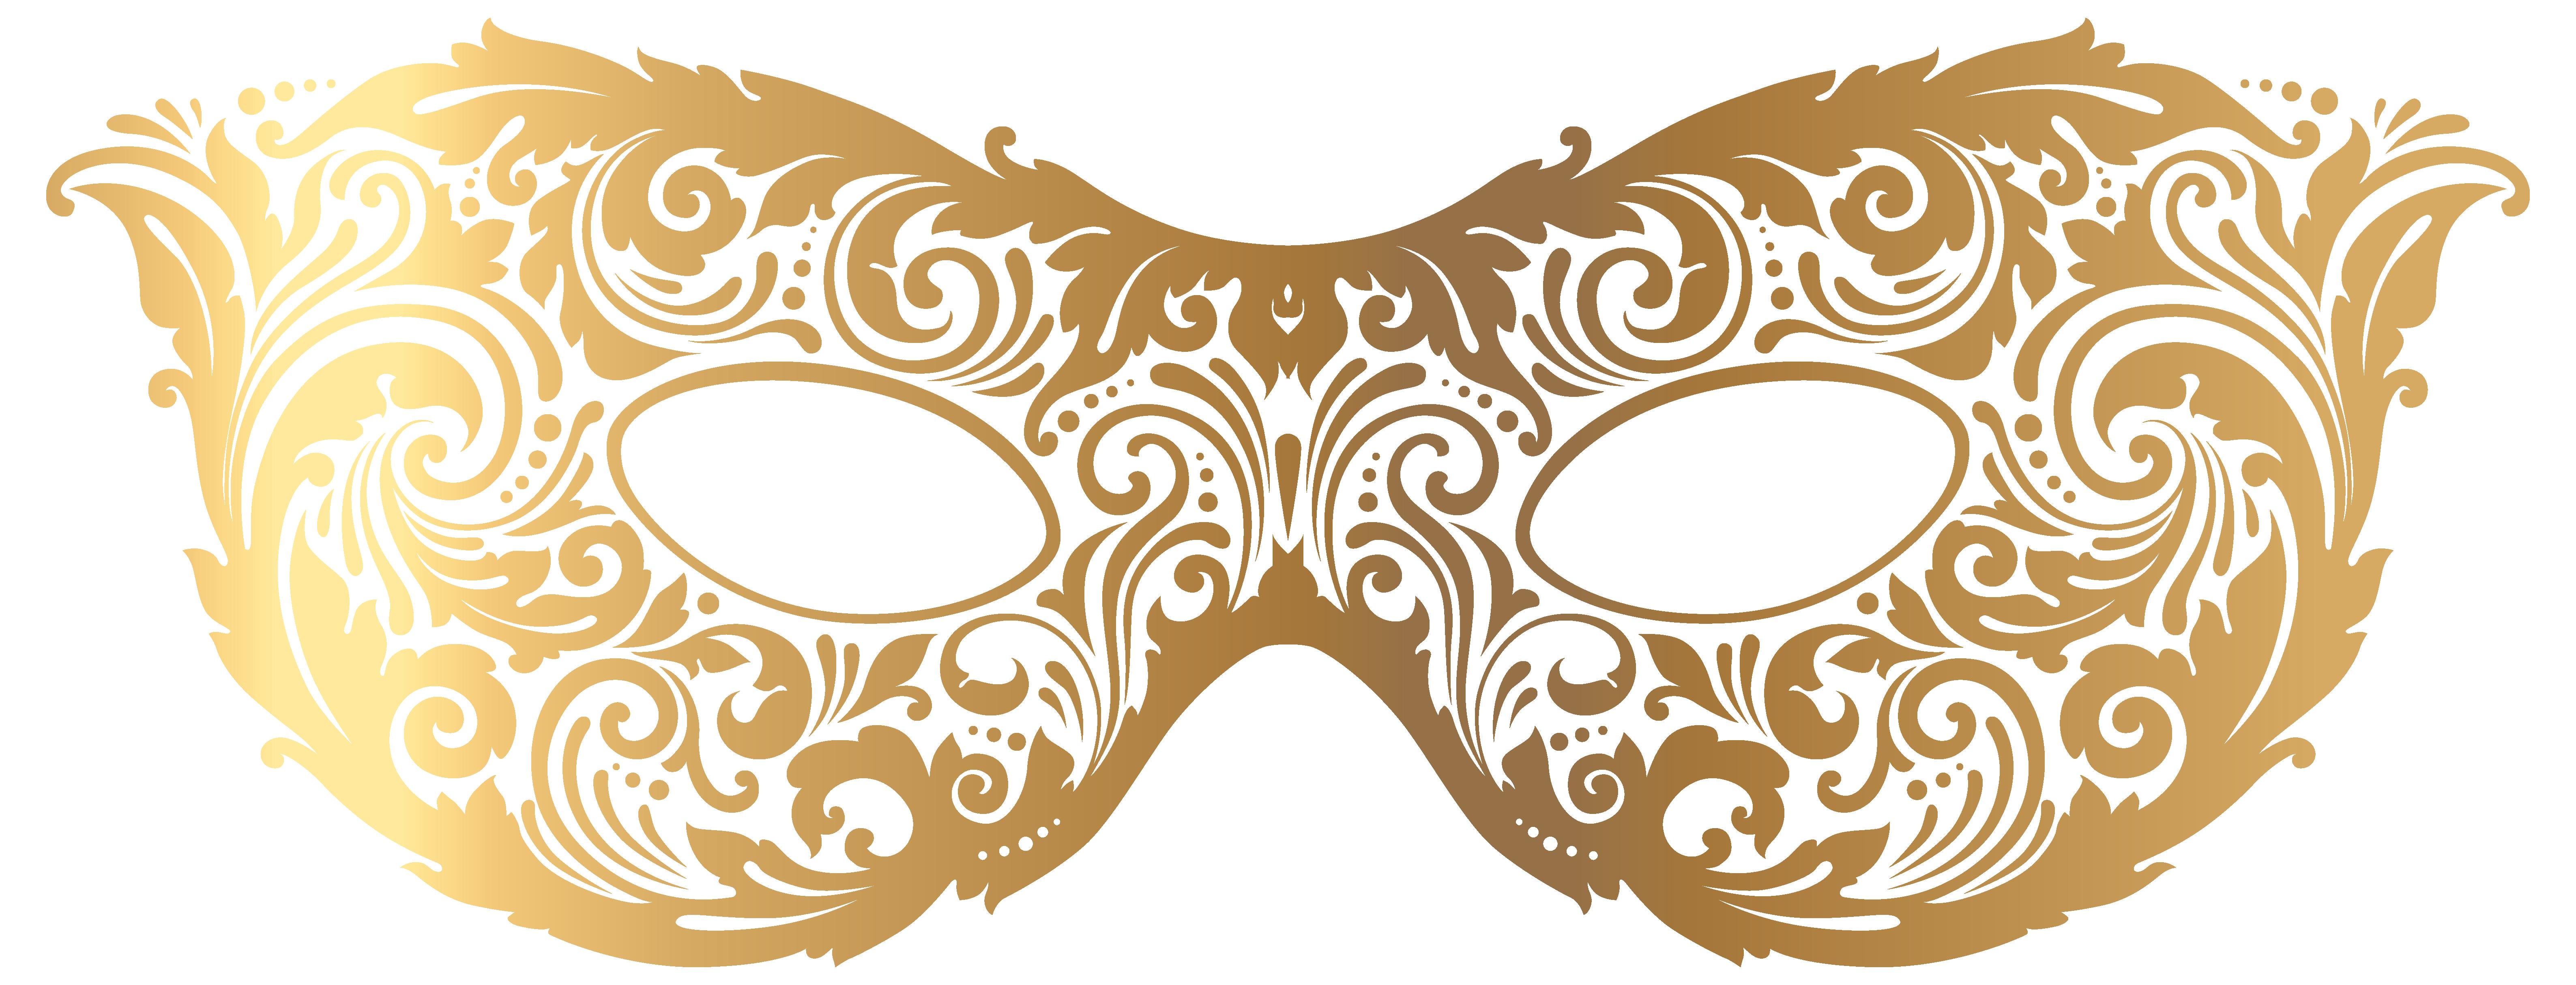 Masquerade Mask Vector Free Download at GetDrawings.com.